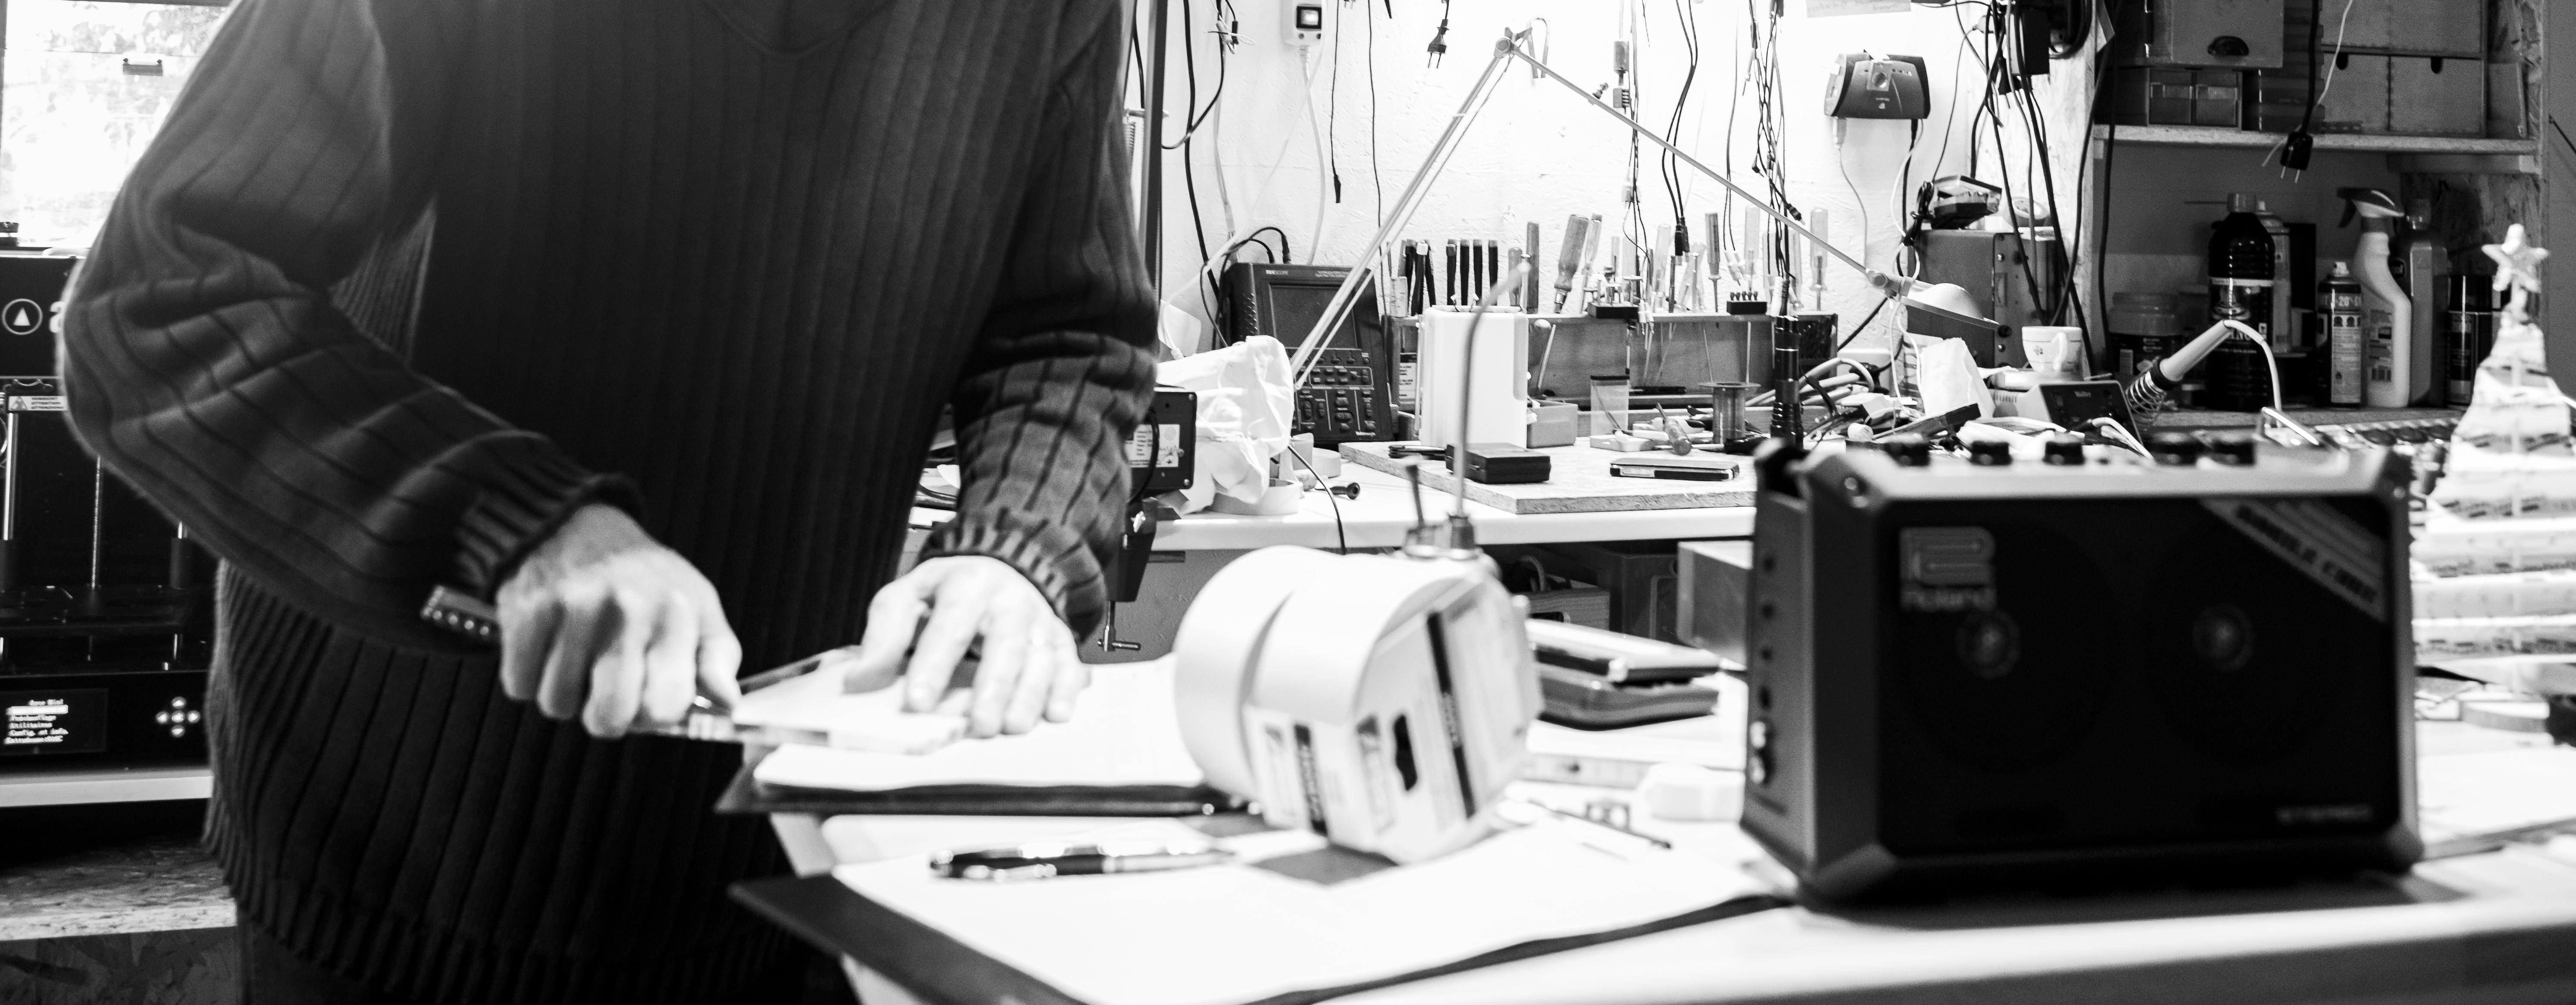 La Filature - La Sarraz - Centre artisanal et associatif